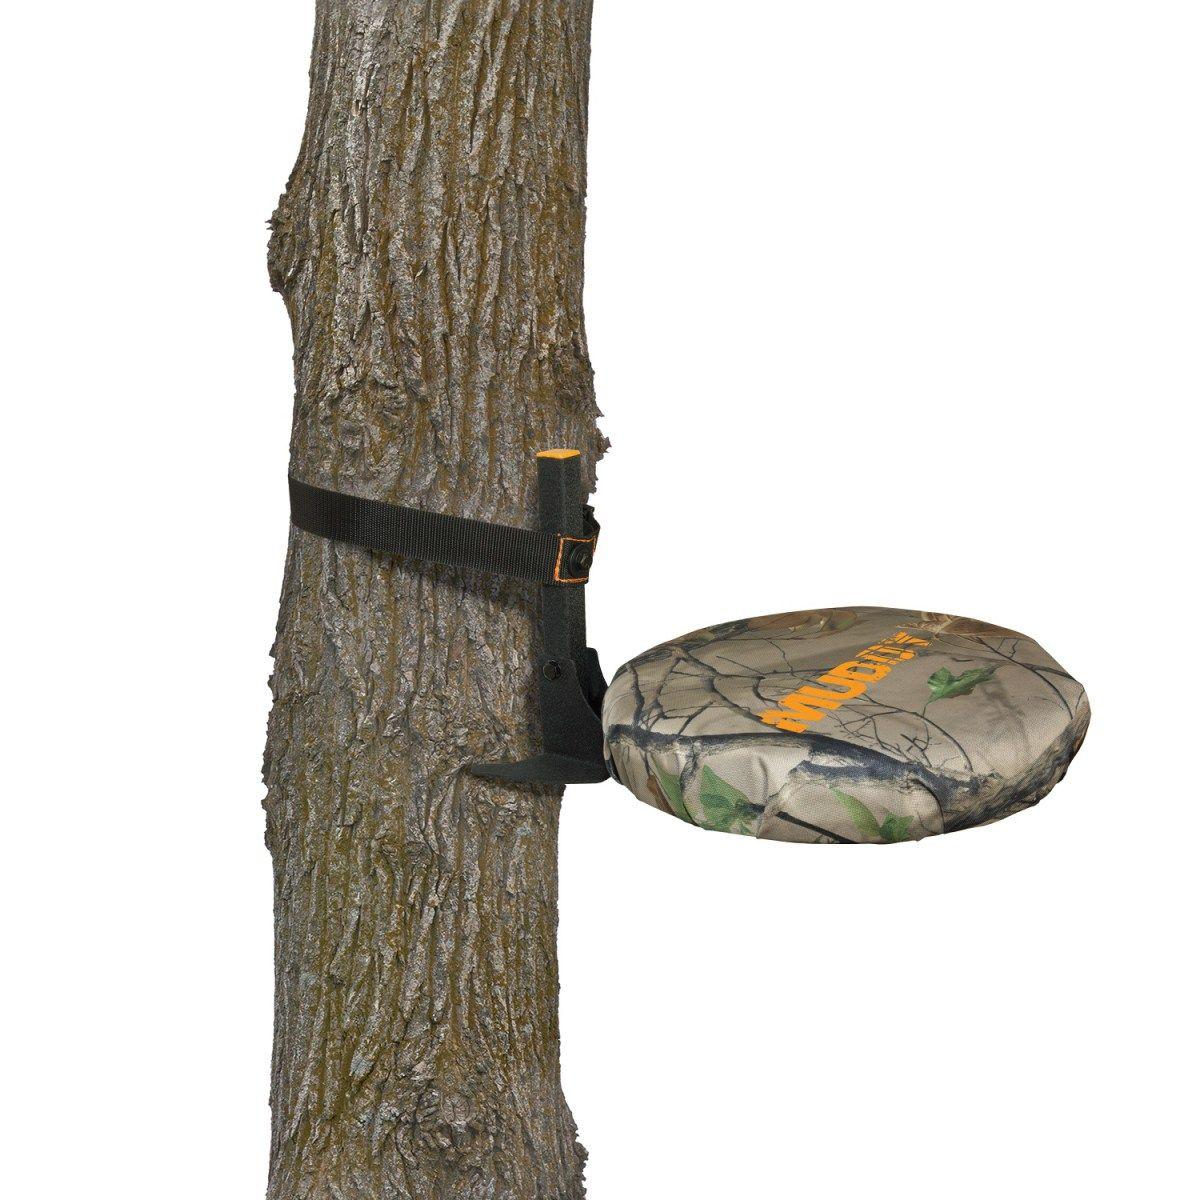 MUDDY ULTIMATE SWIVEL TREESEAT Tree stand accessories